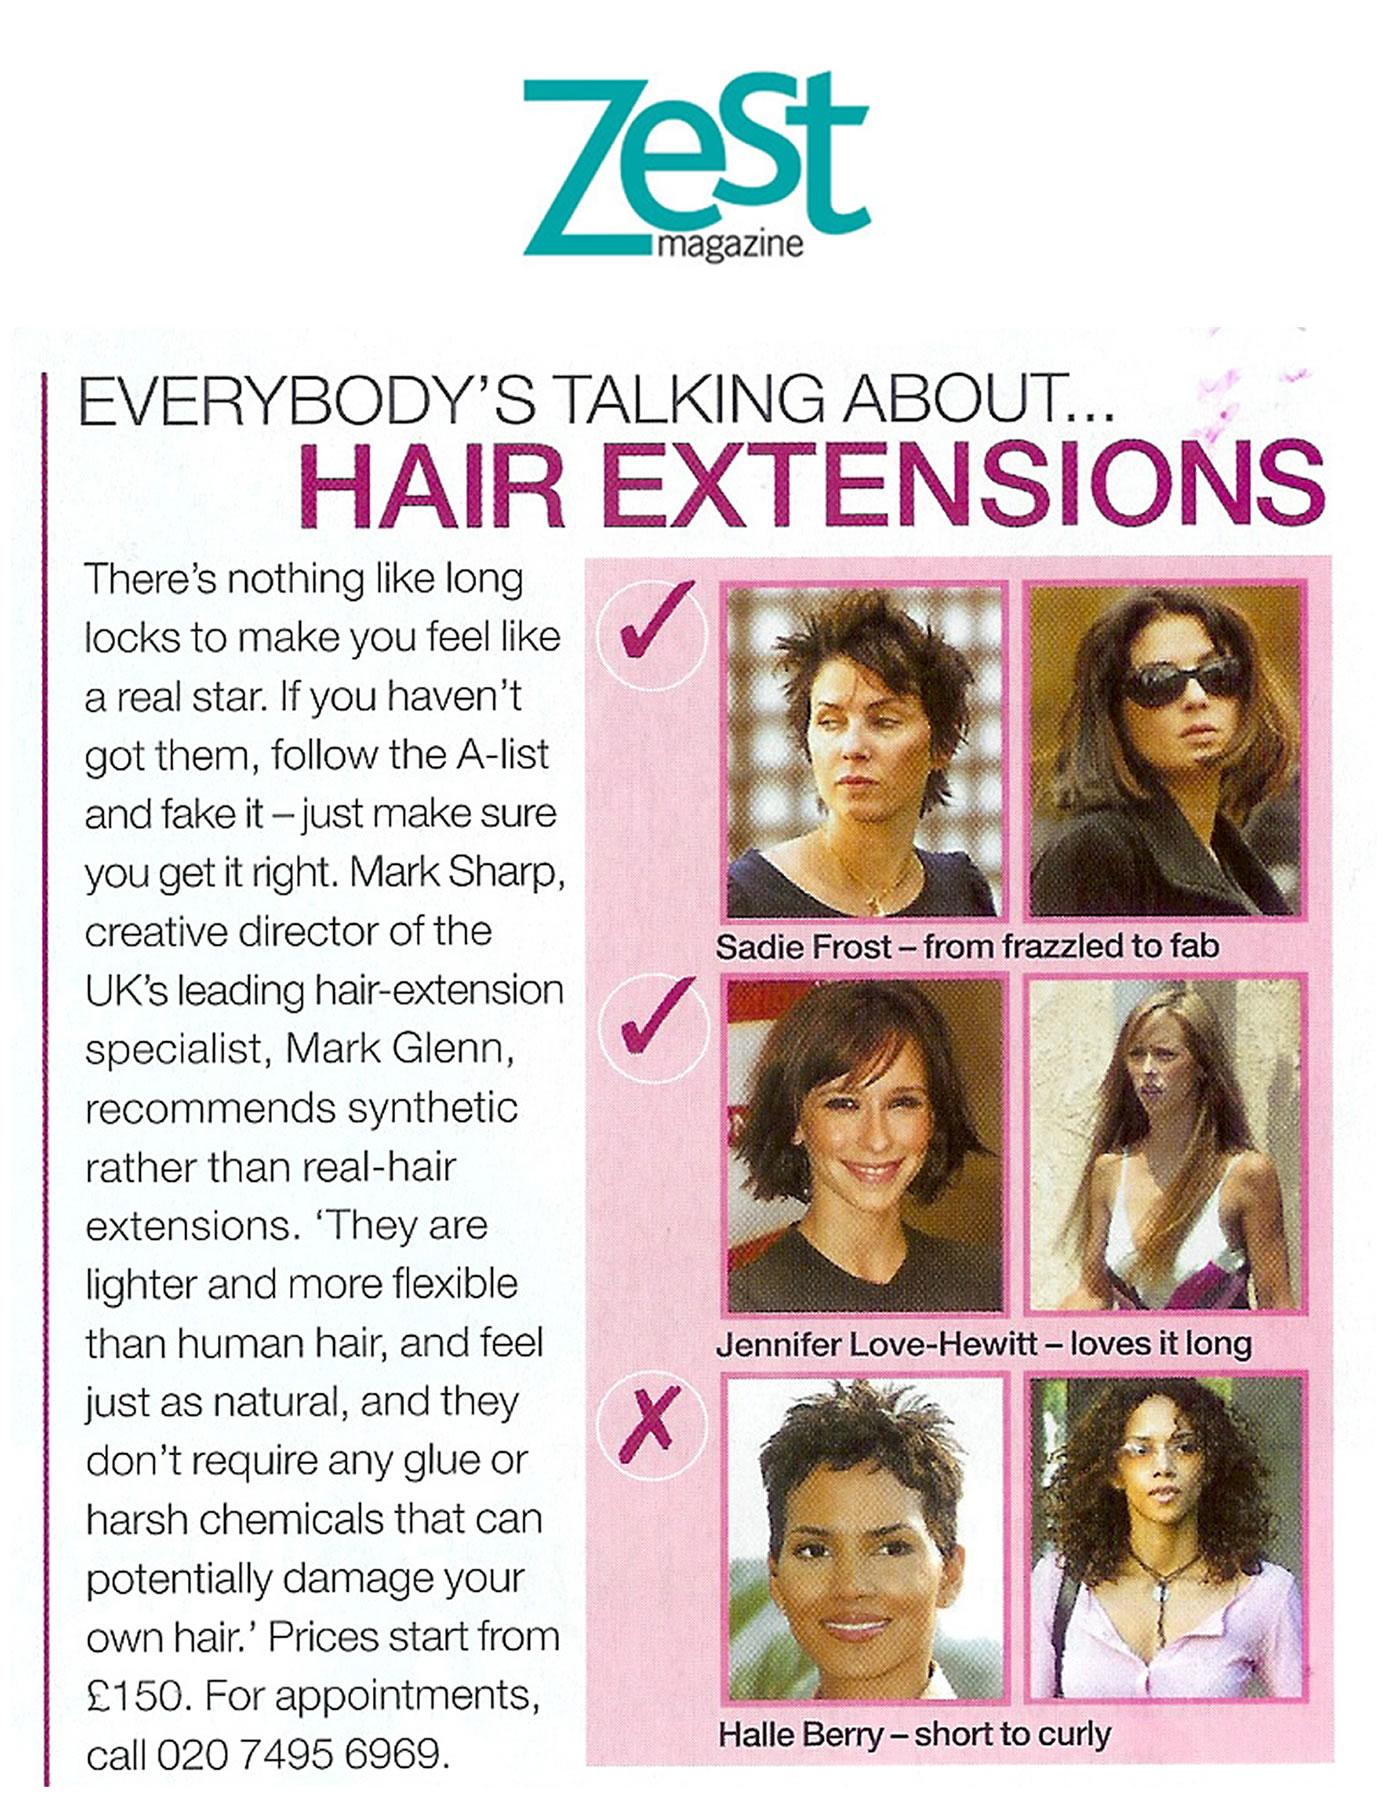 Mark Glenn - 'The UK's leading hair extension specialists' says Zest Magazine